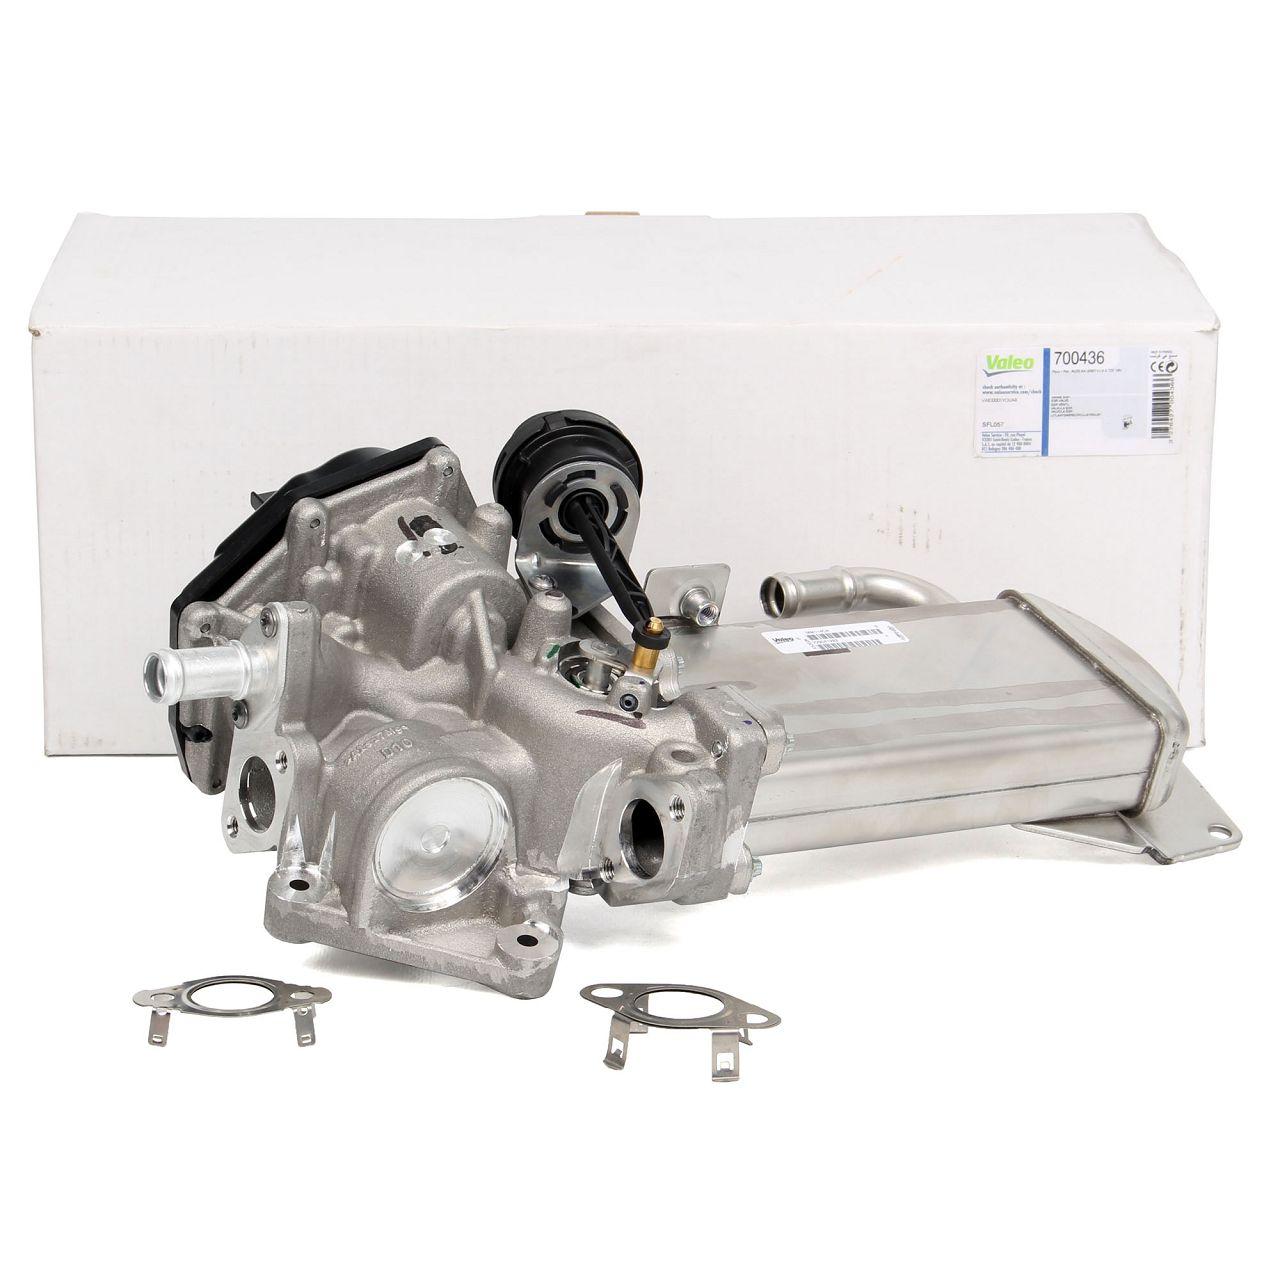 VALEO AGR Ventil Abgaskühler + Dichtungen AUDI A4 B8 A5 8T 8F A6 C7 Q5 8R 2.0 TDI